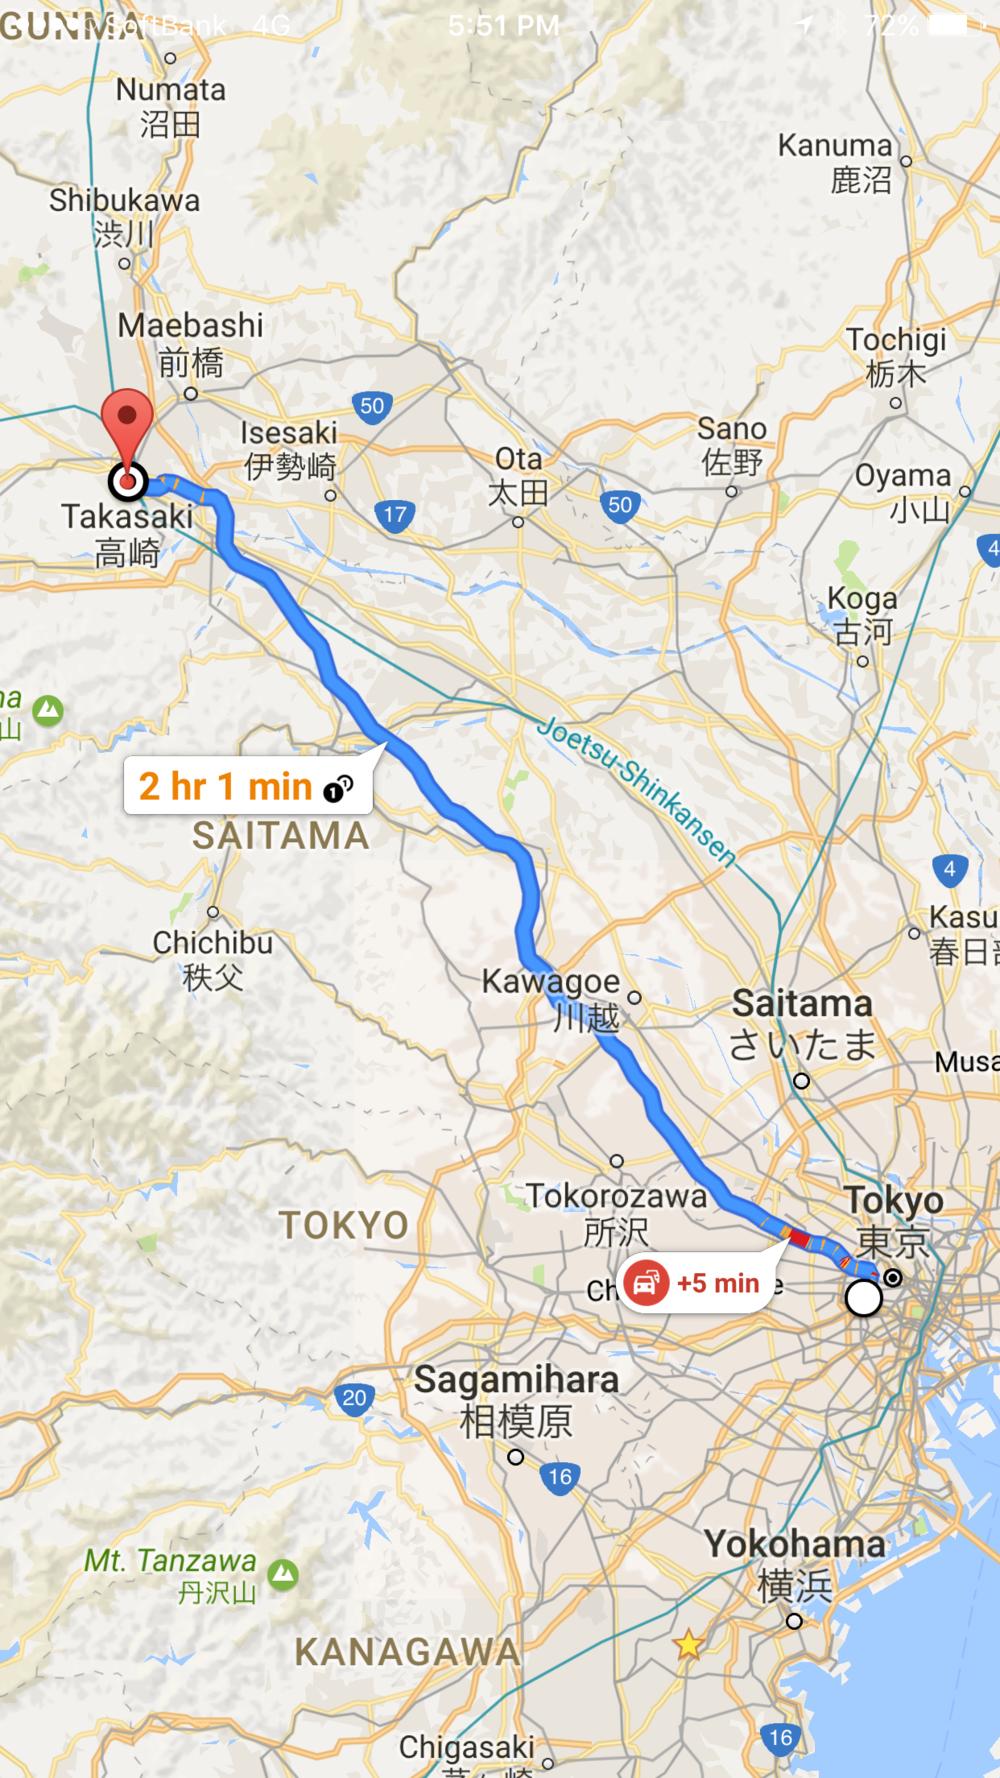 Tokyo to the Takasaki, Gunma Supercharger